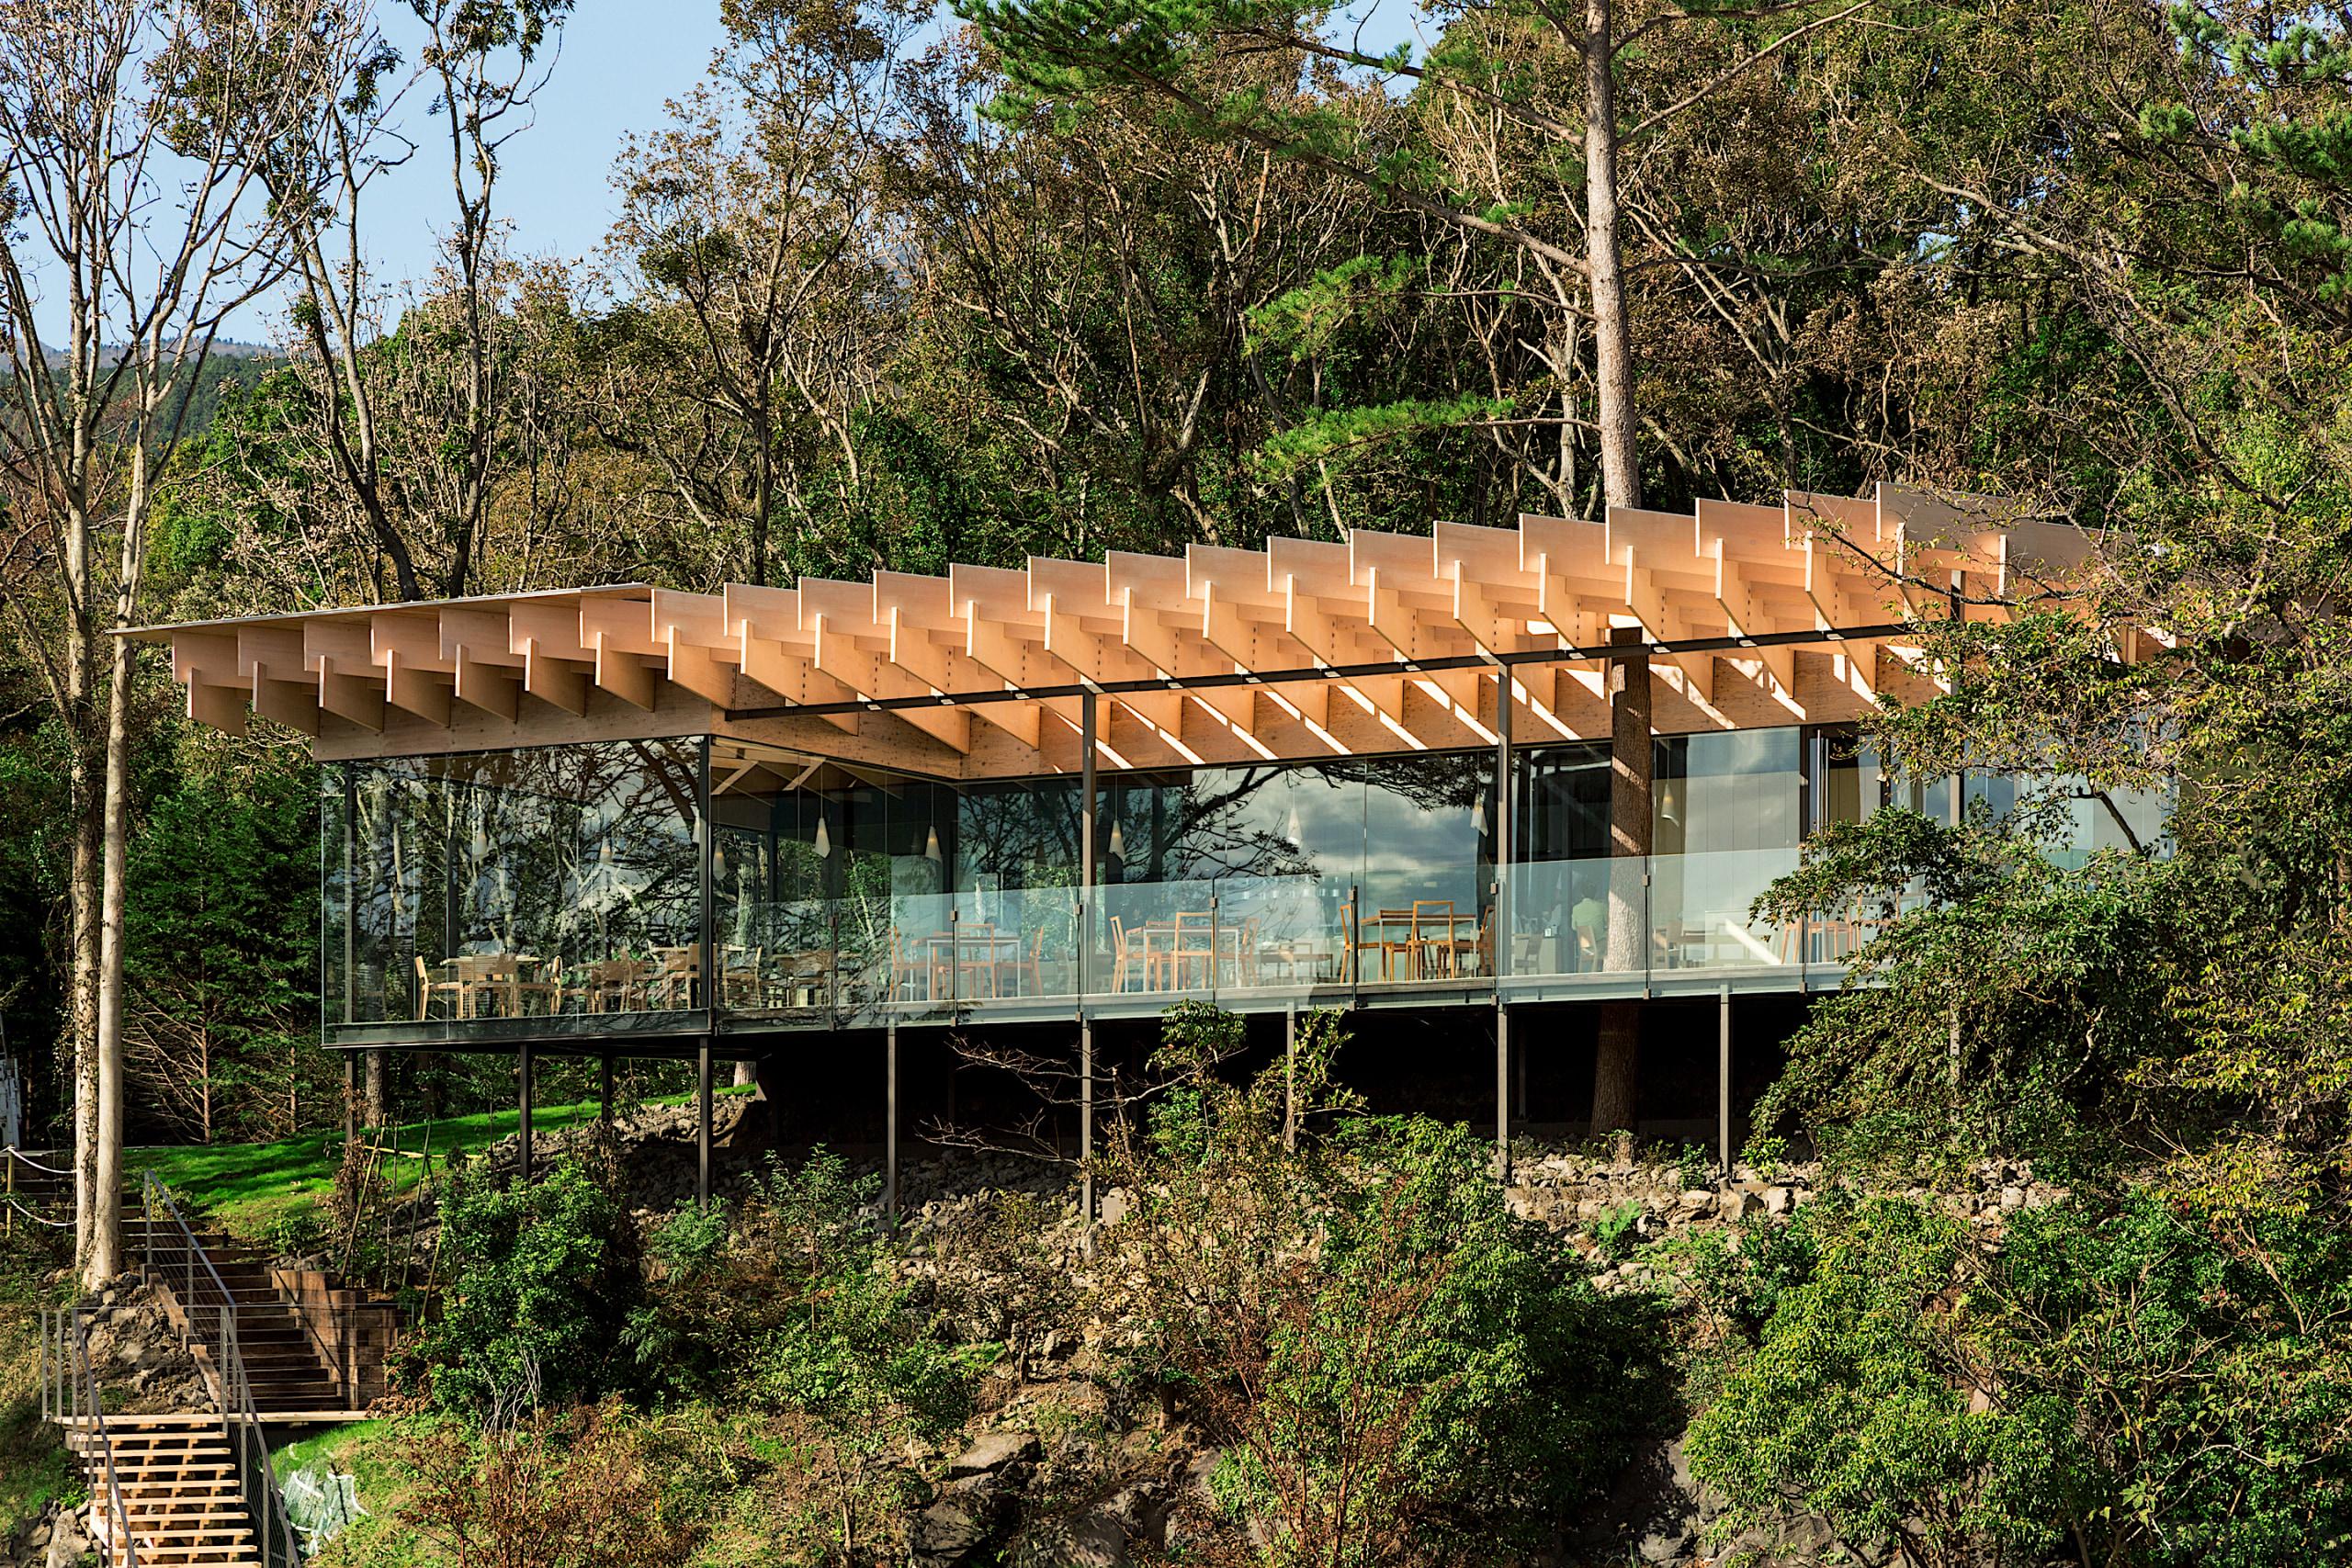 The kakezukuri construction method uses supports to float black, brown